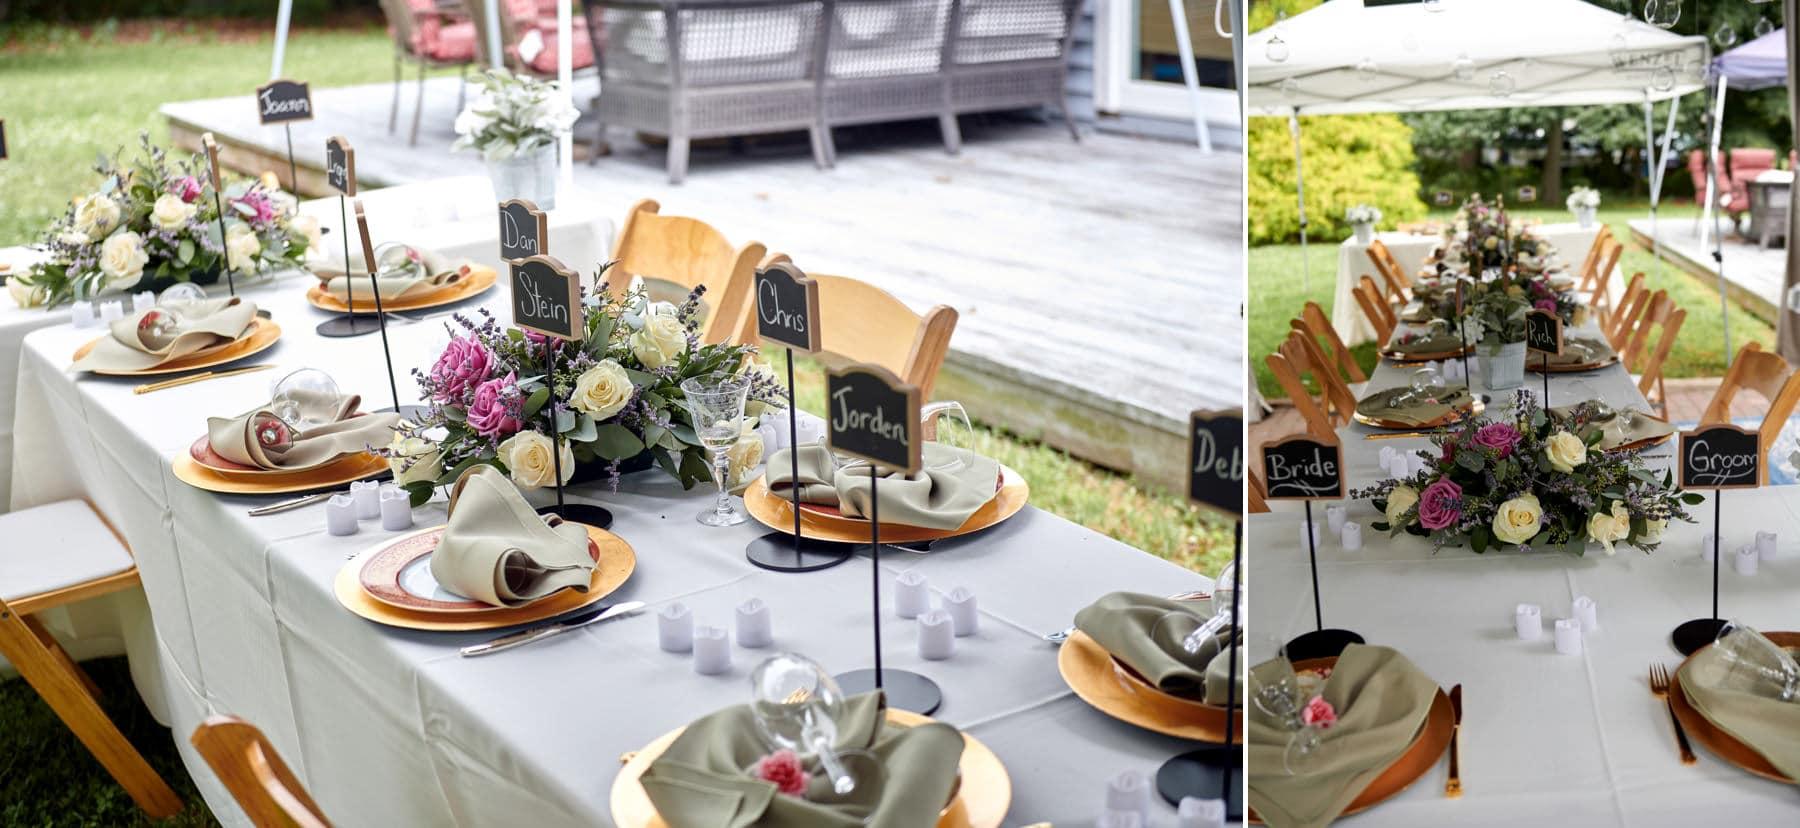 backyard wedding table detail photos